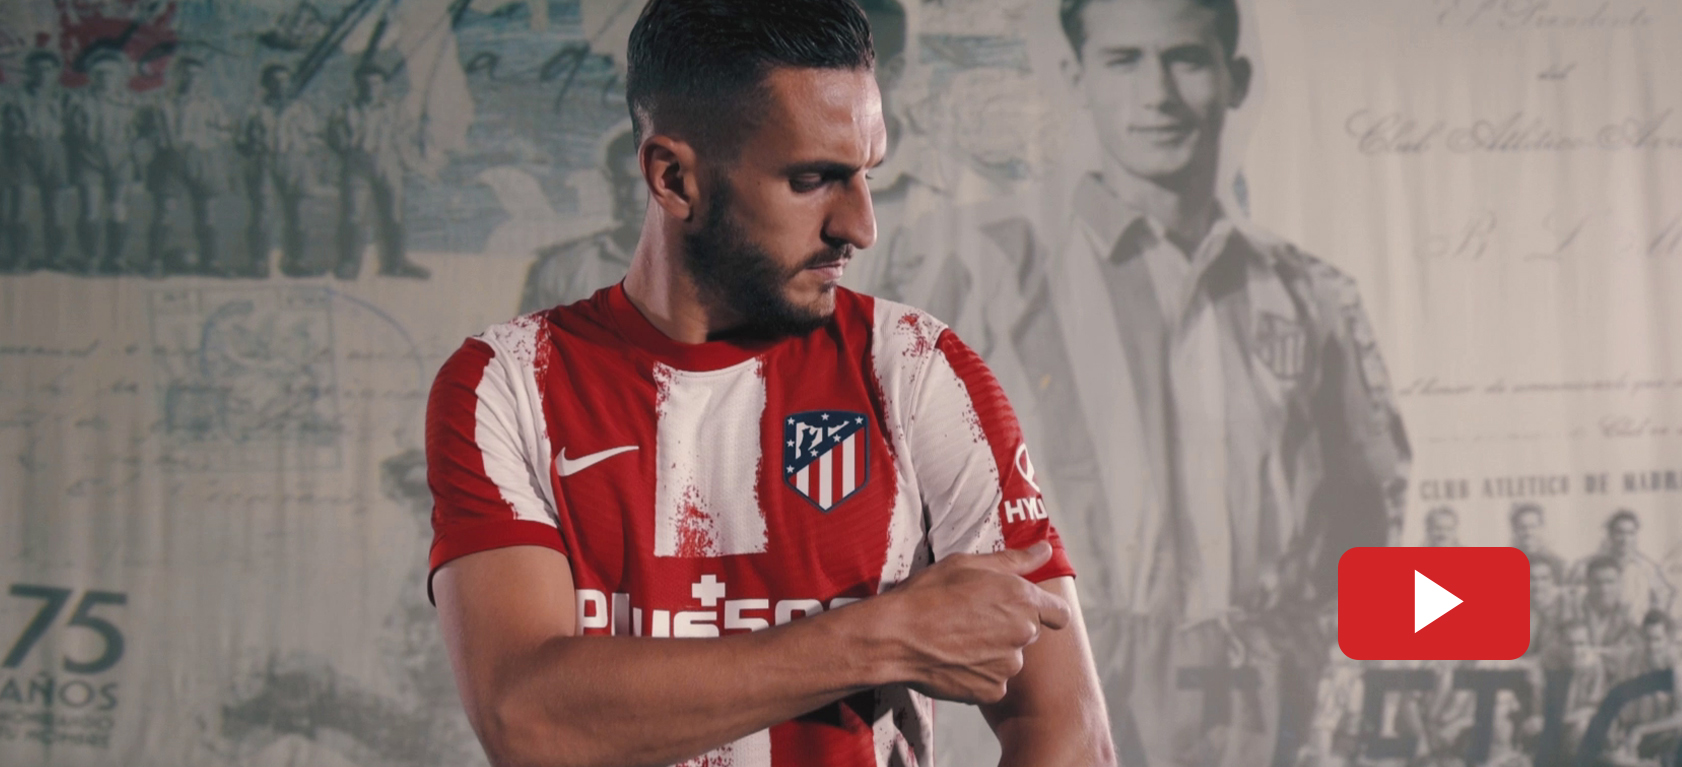 Atletico De Madrid Kits 2021 22